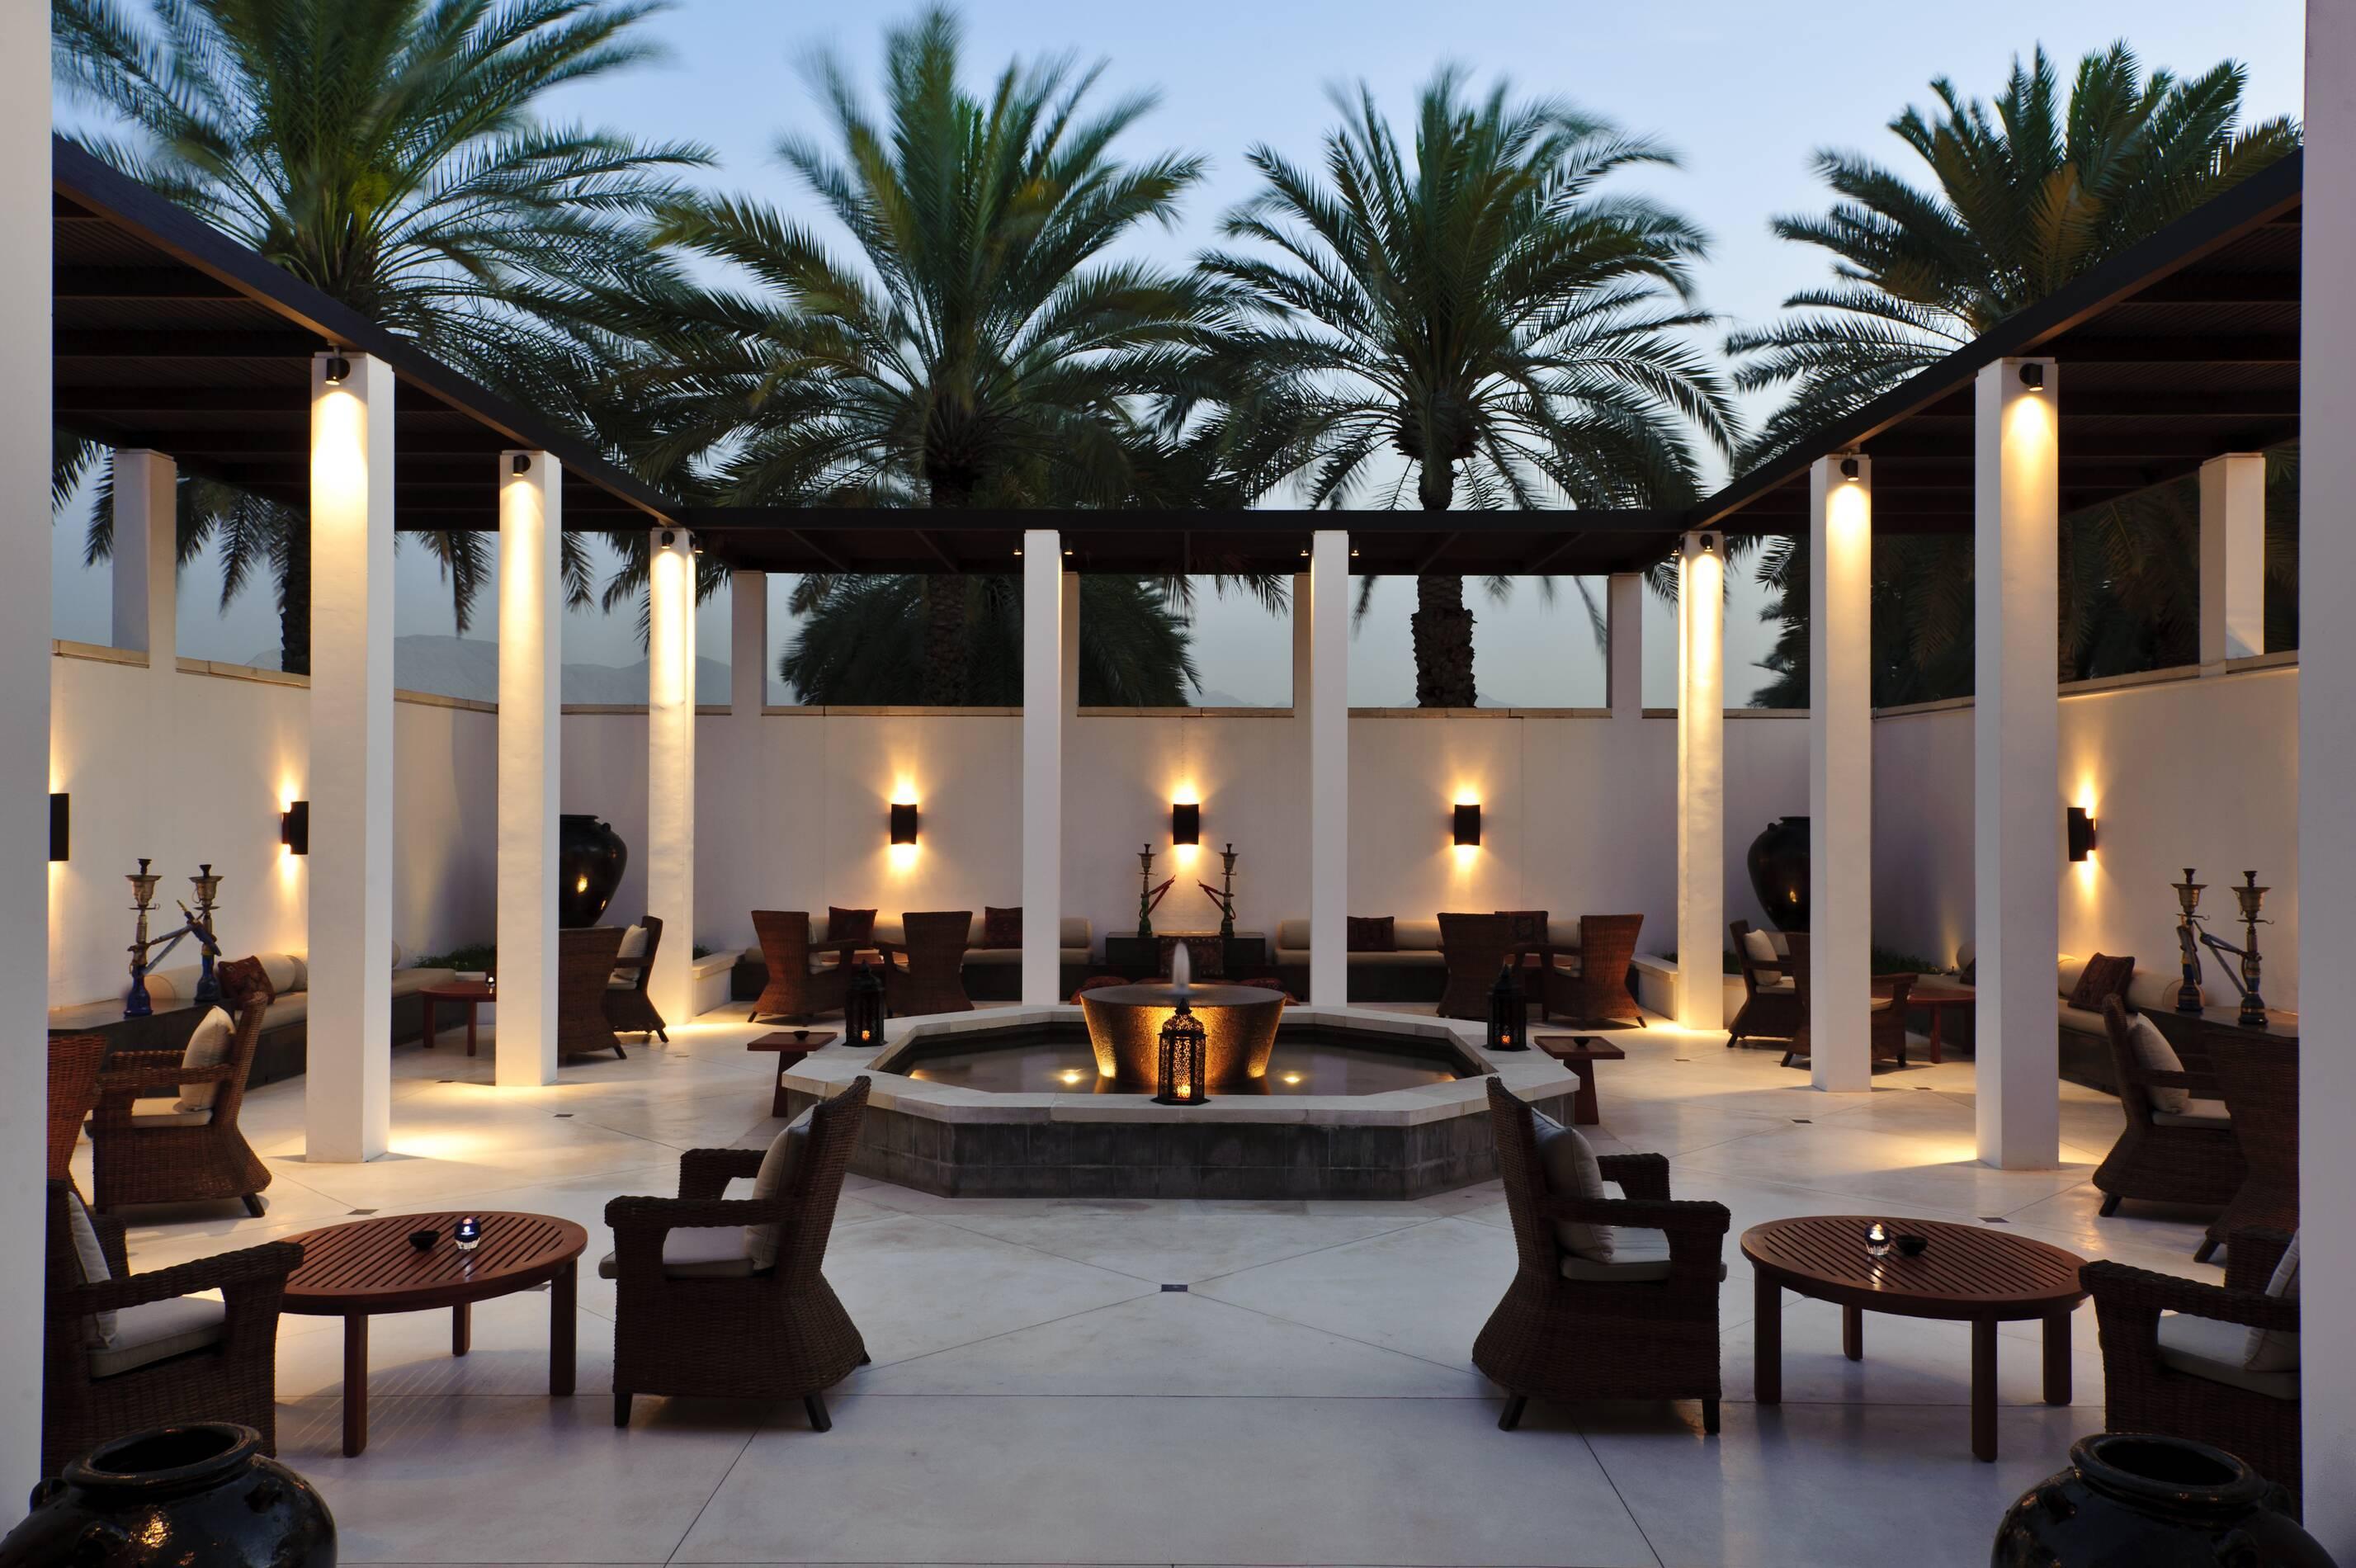 Chedi Muscat Oman courtyard